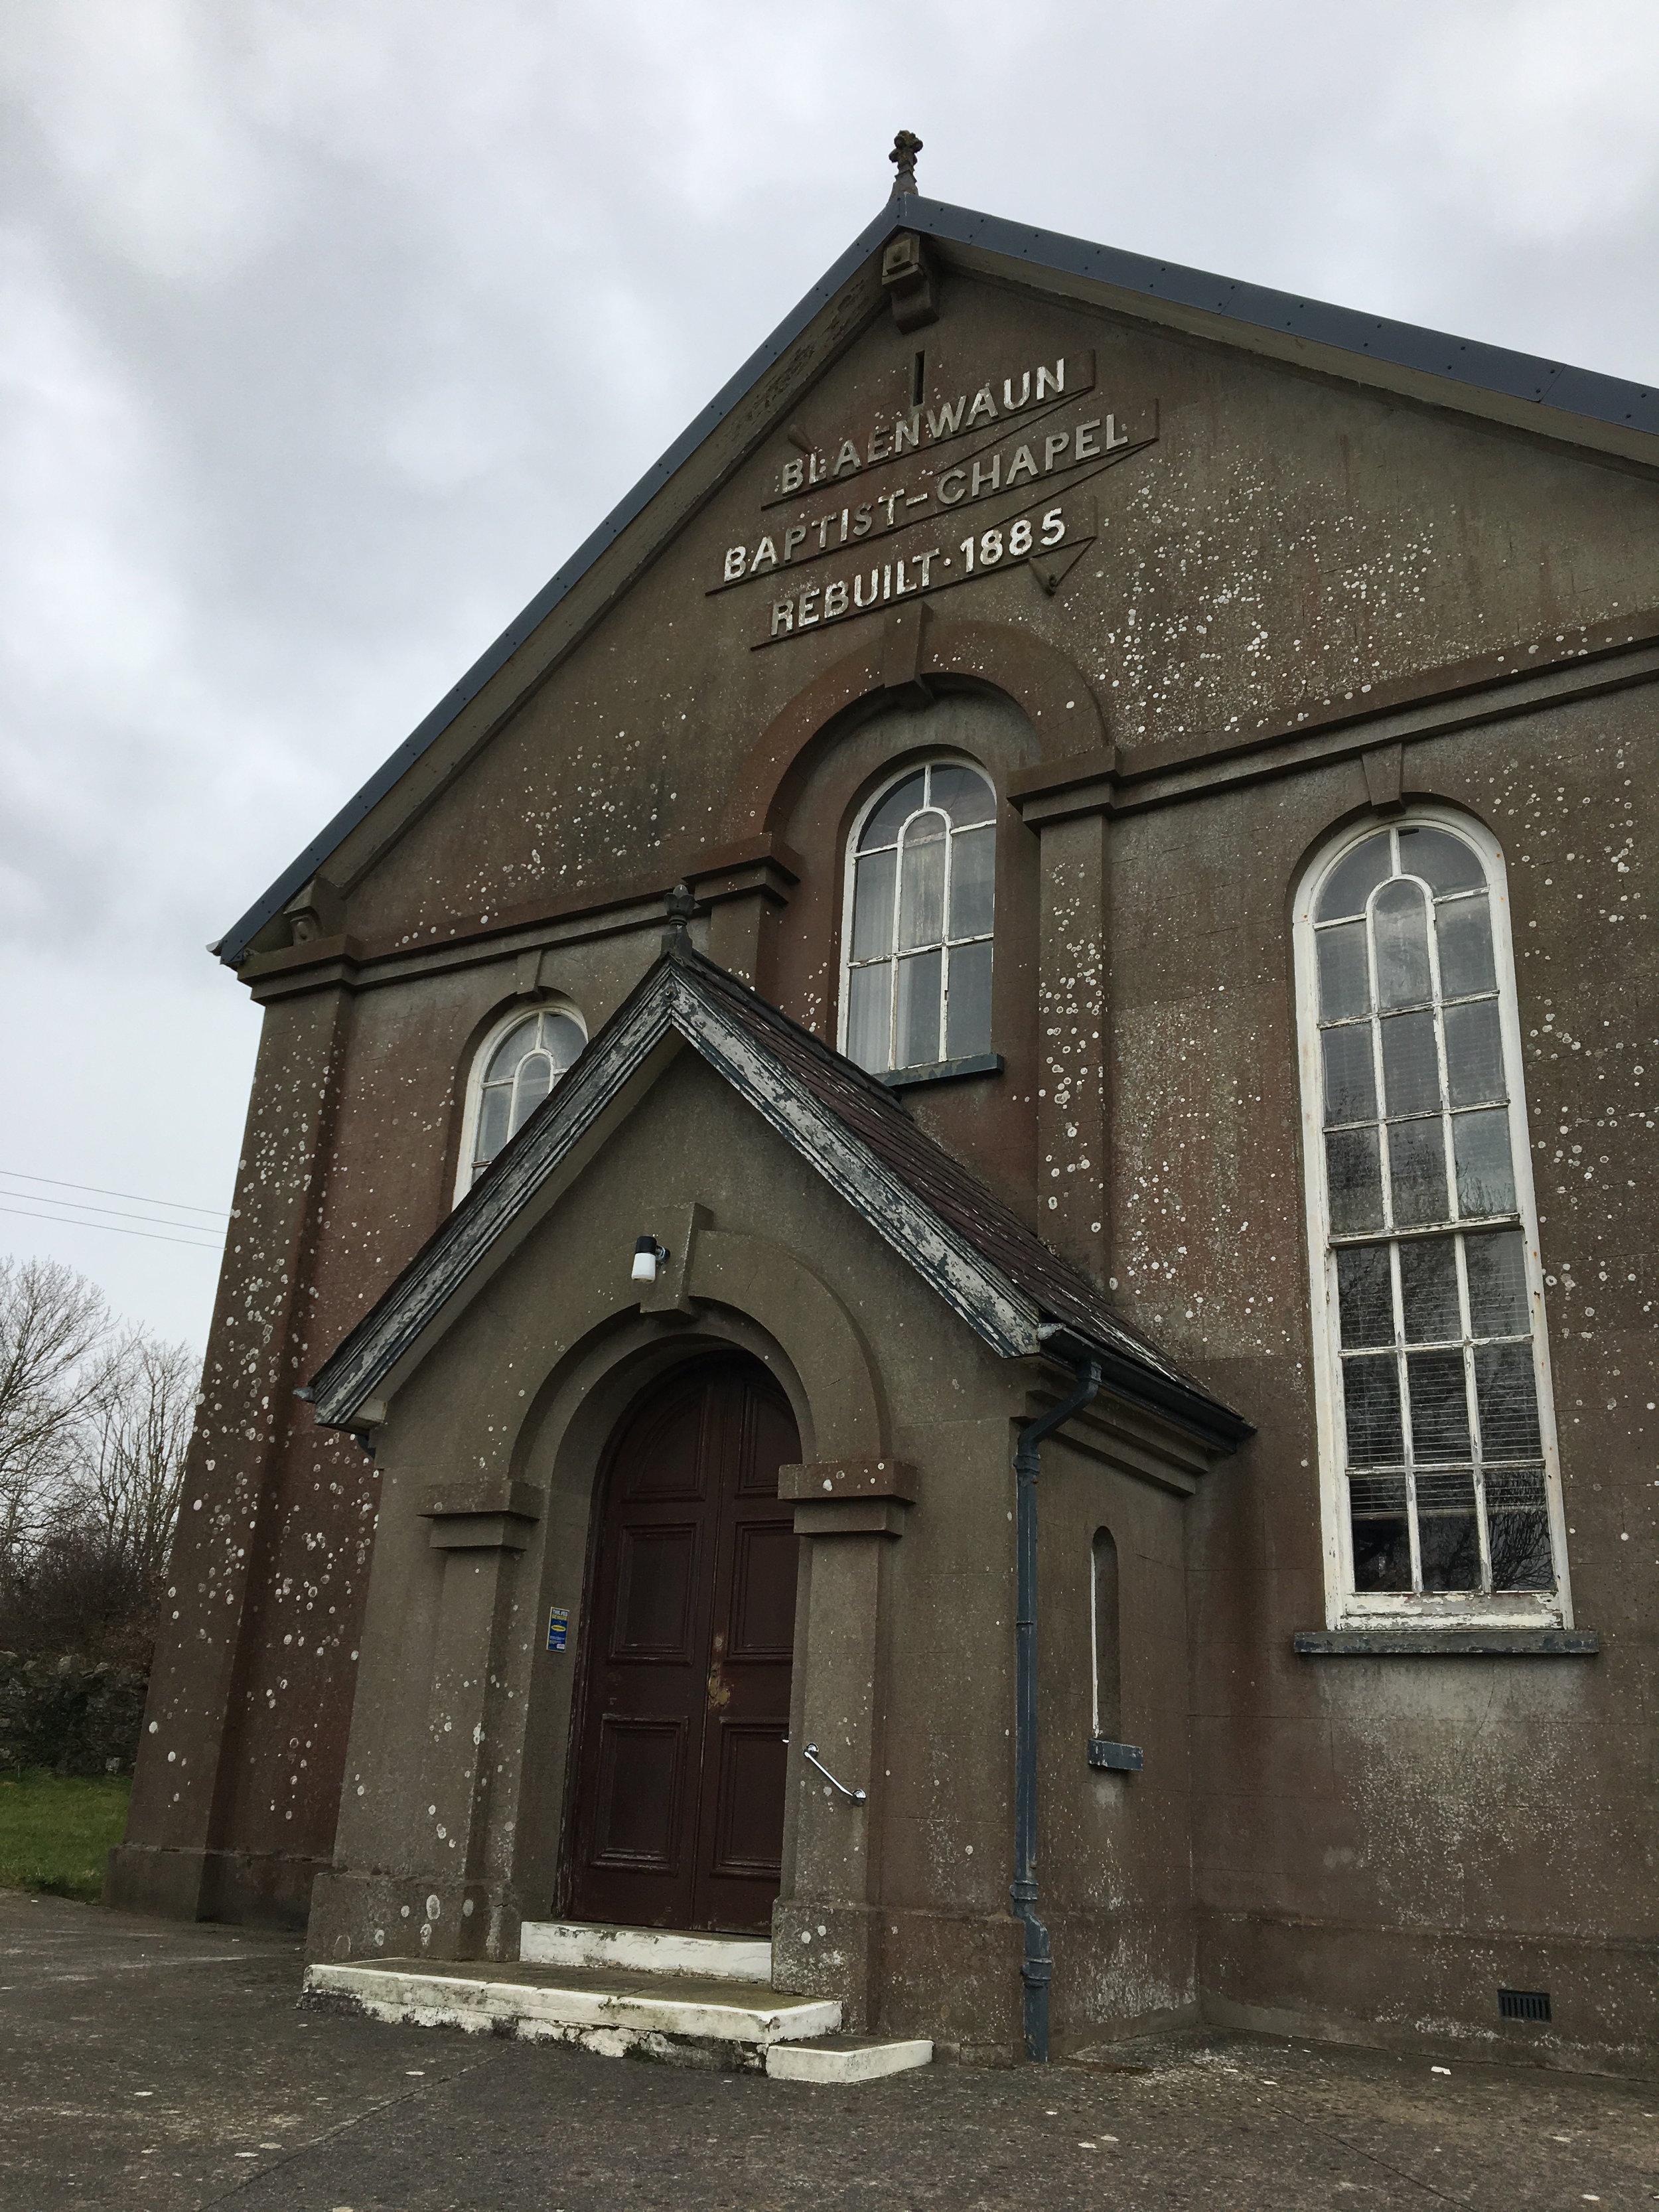 Capel Blaenwaun, Llandudoch, ger Aberteifi.  Blaenwaun Chapel, St Dogmaels, near Cardigan.